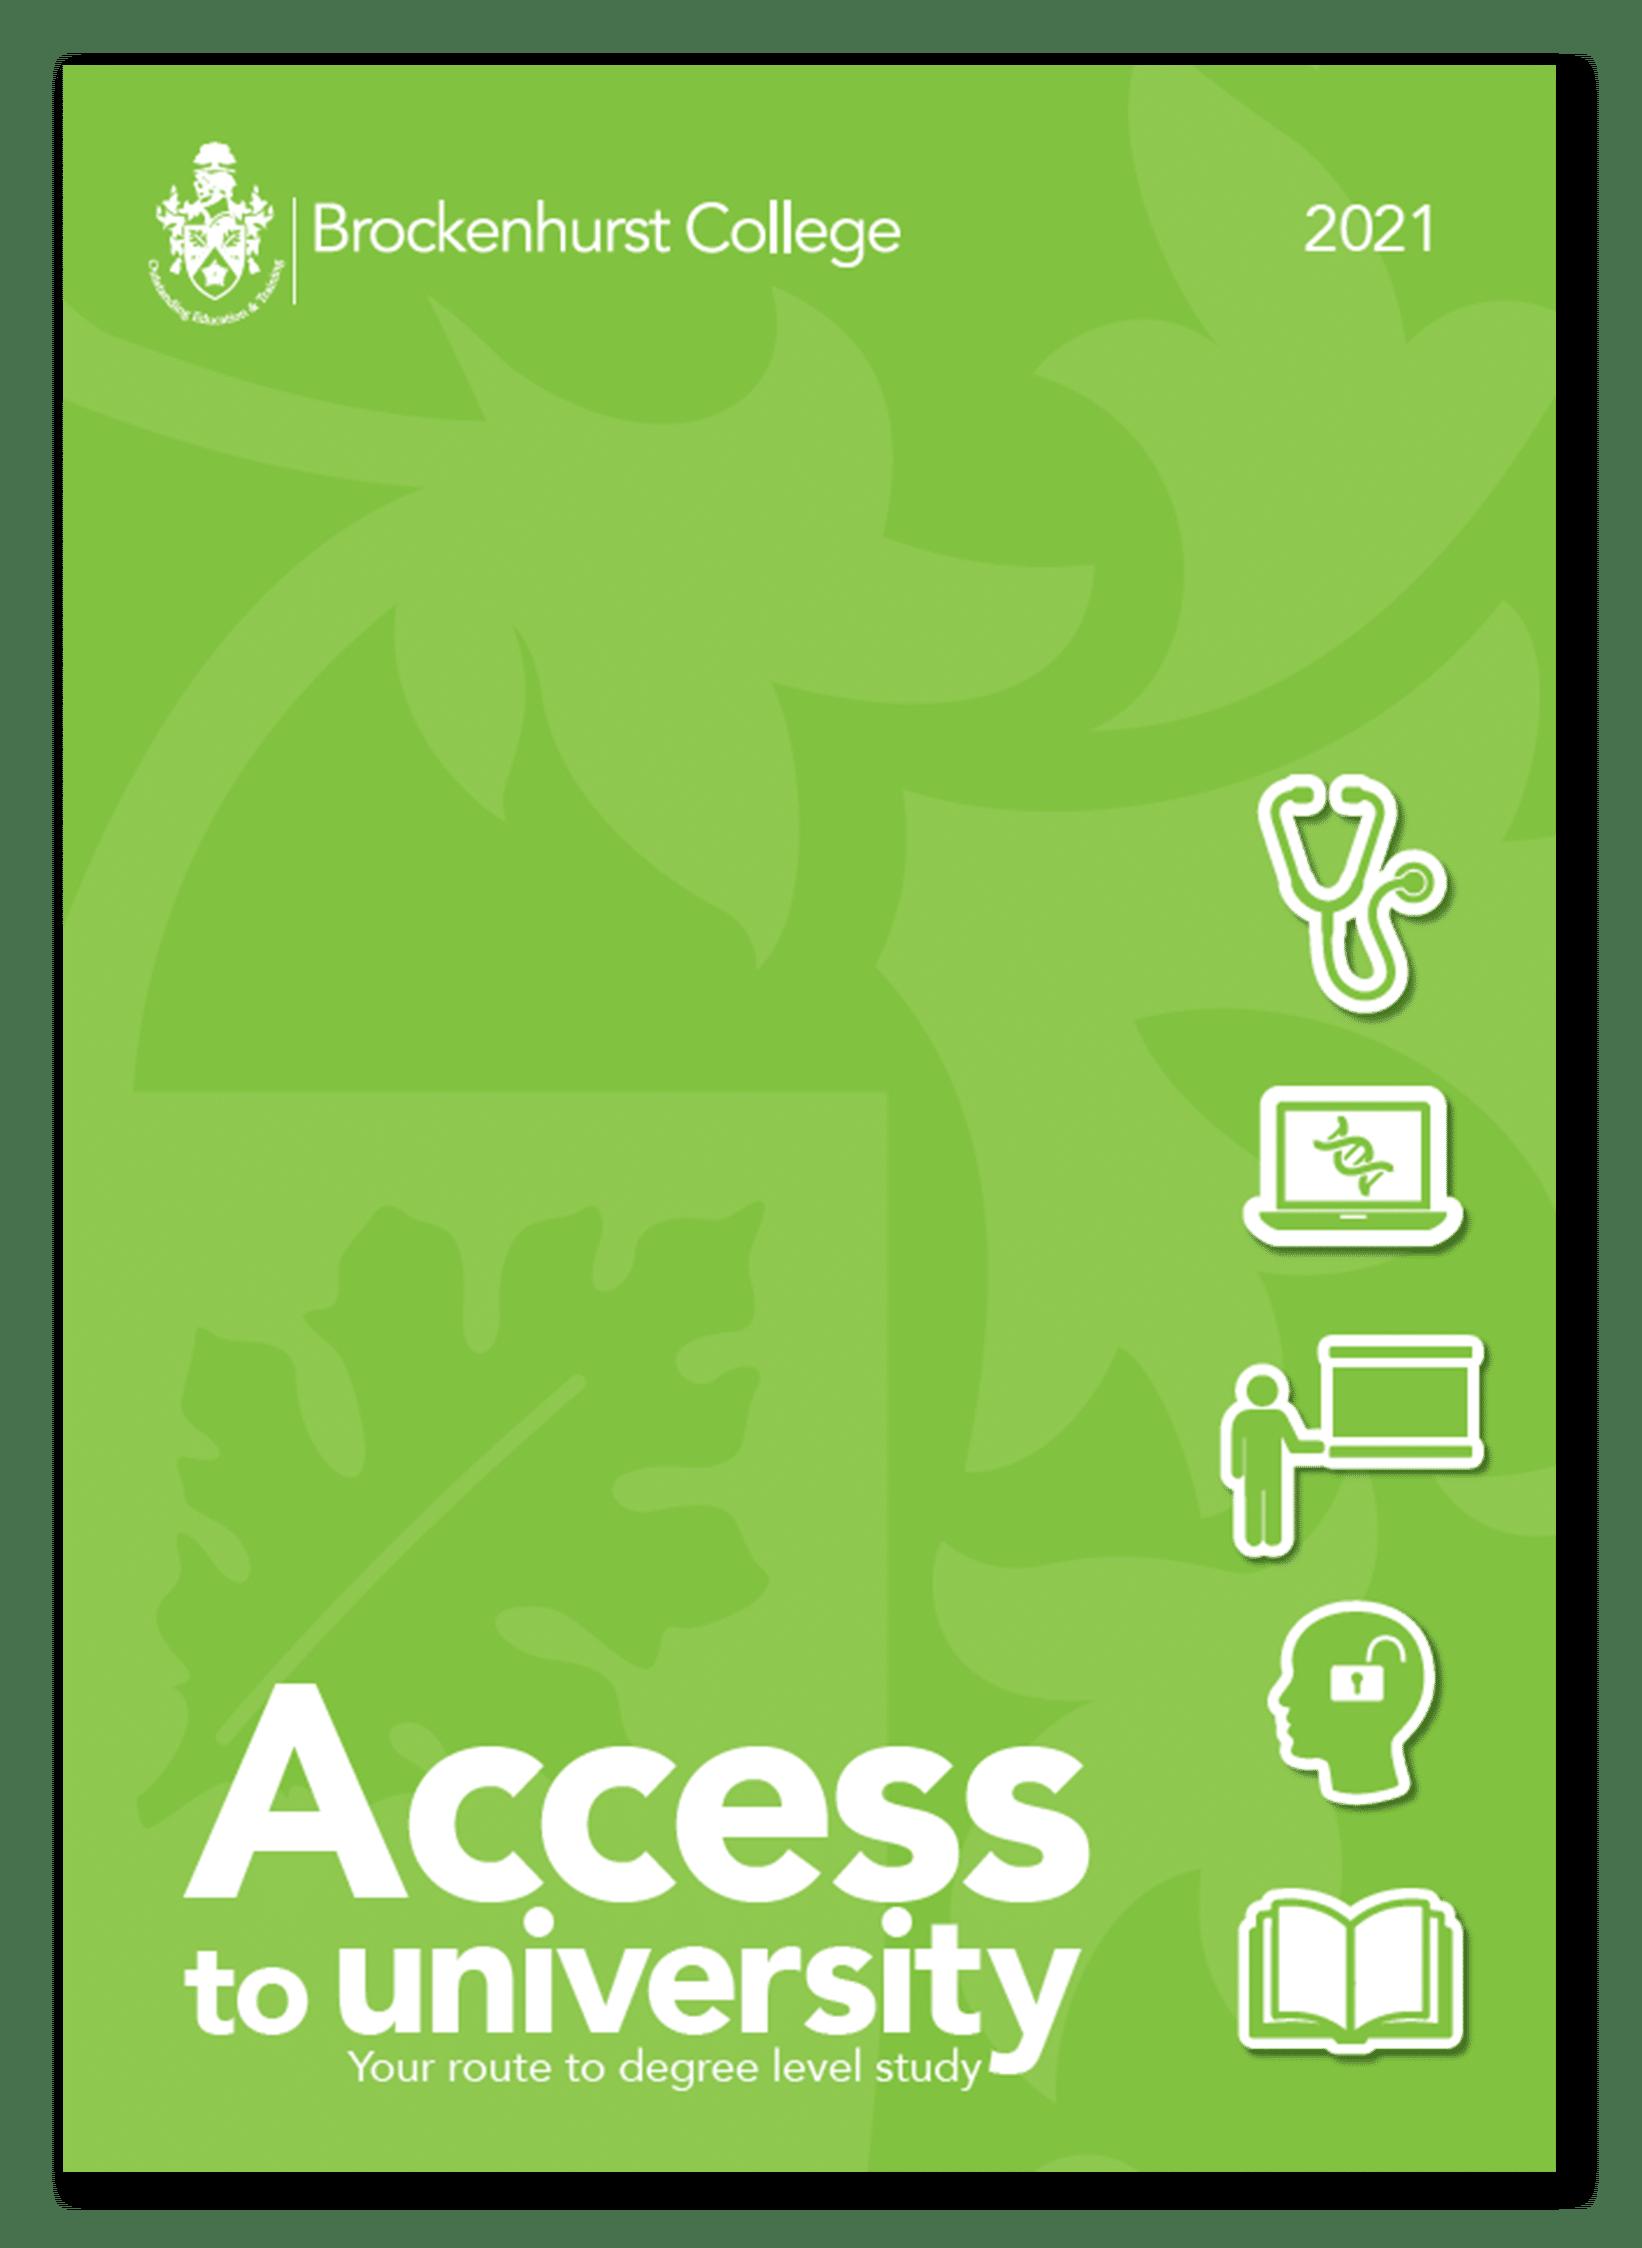 Access to University Brochure 2021